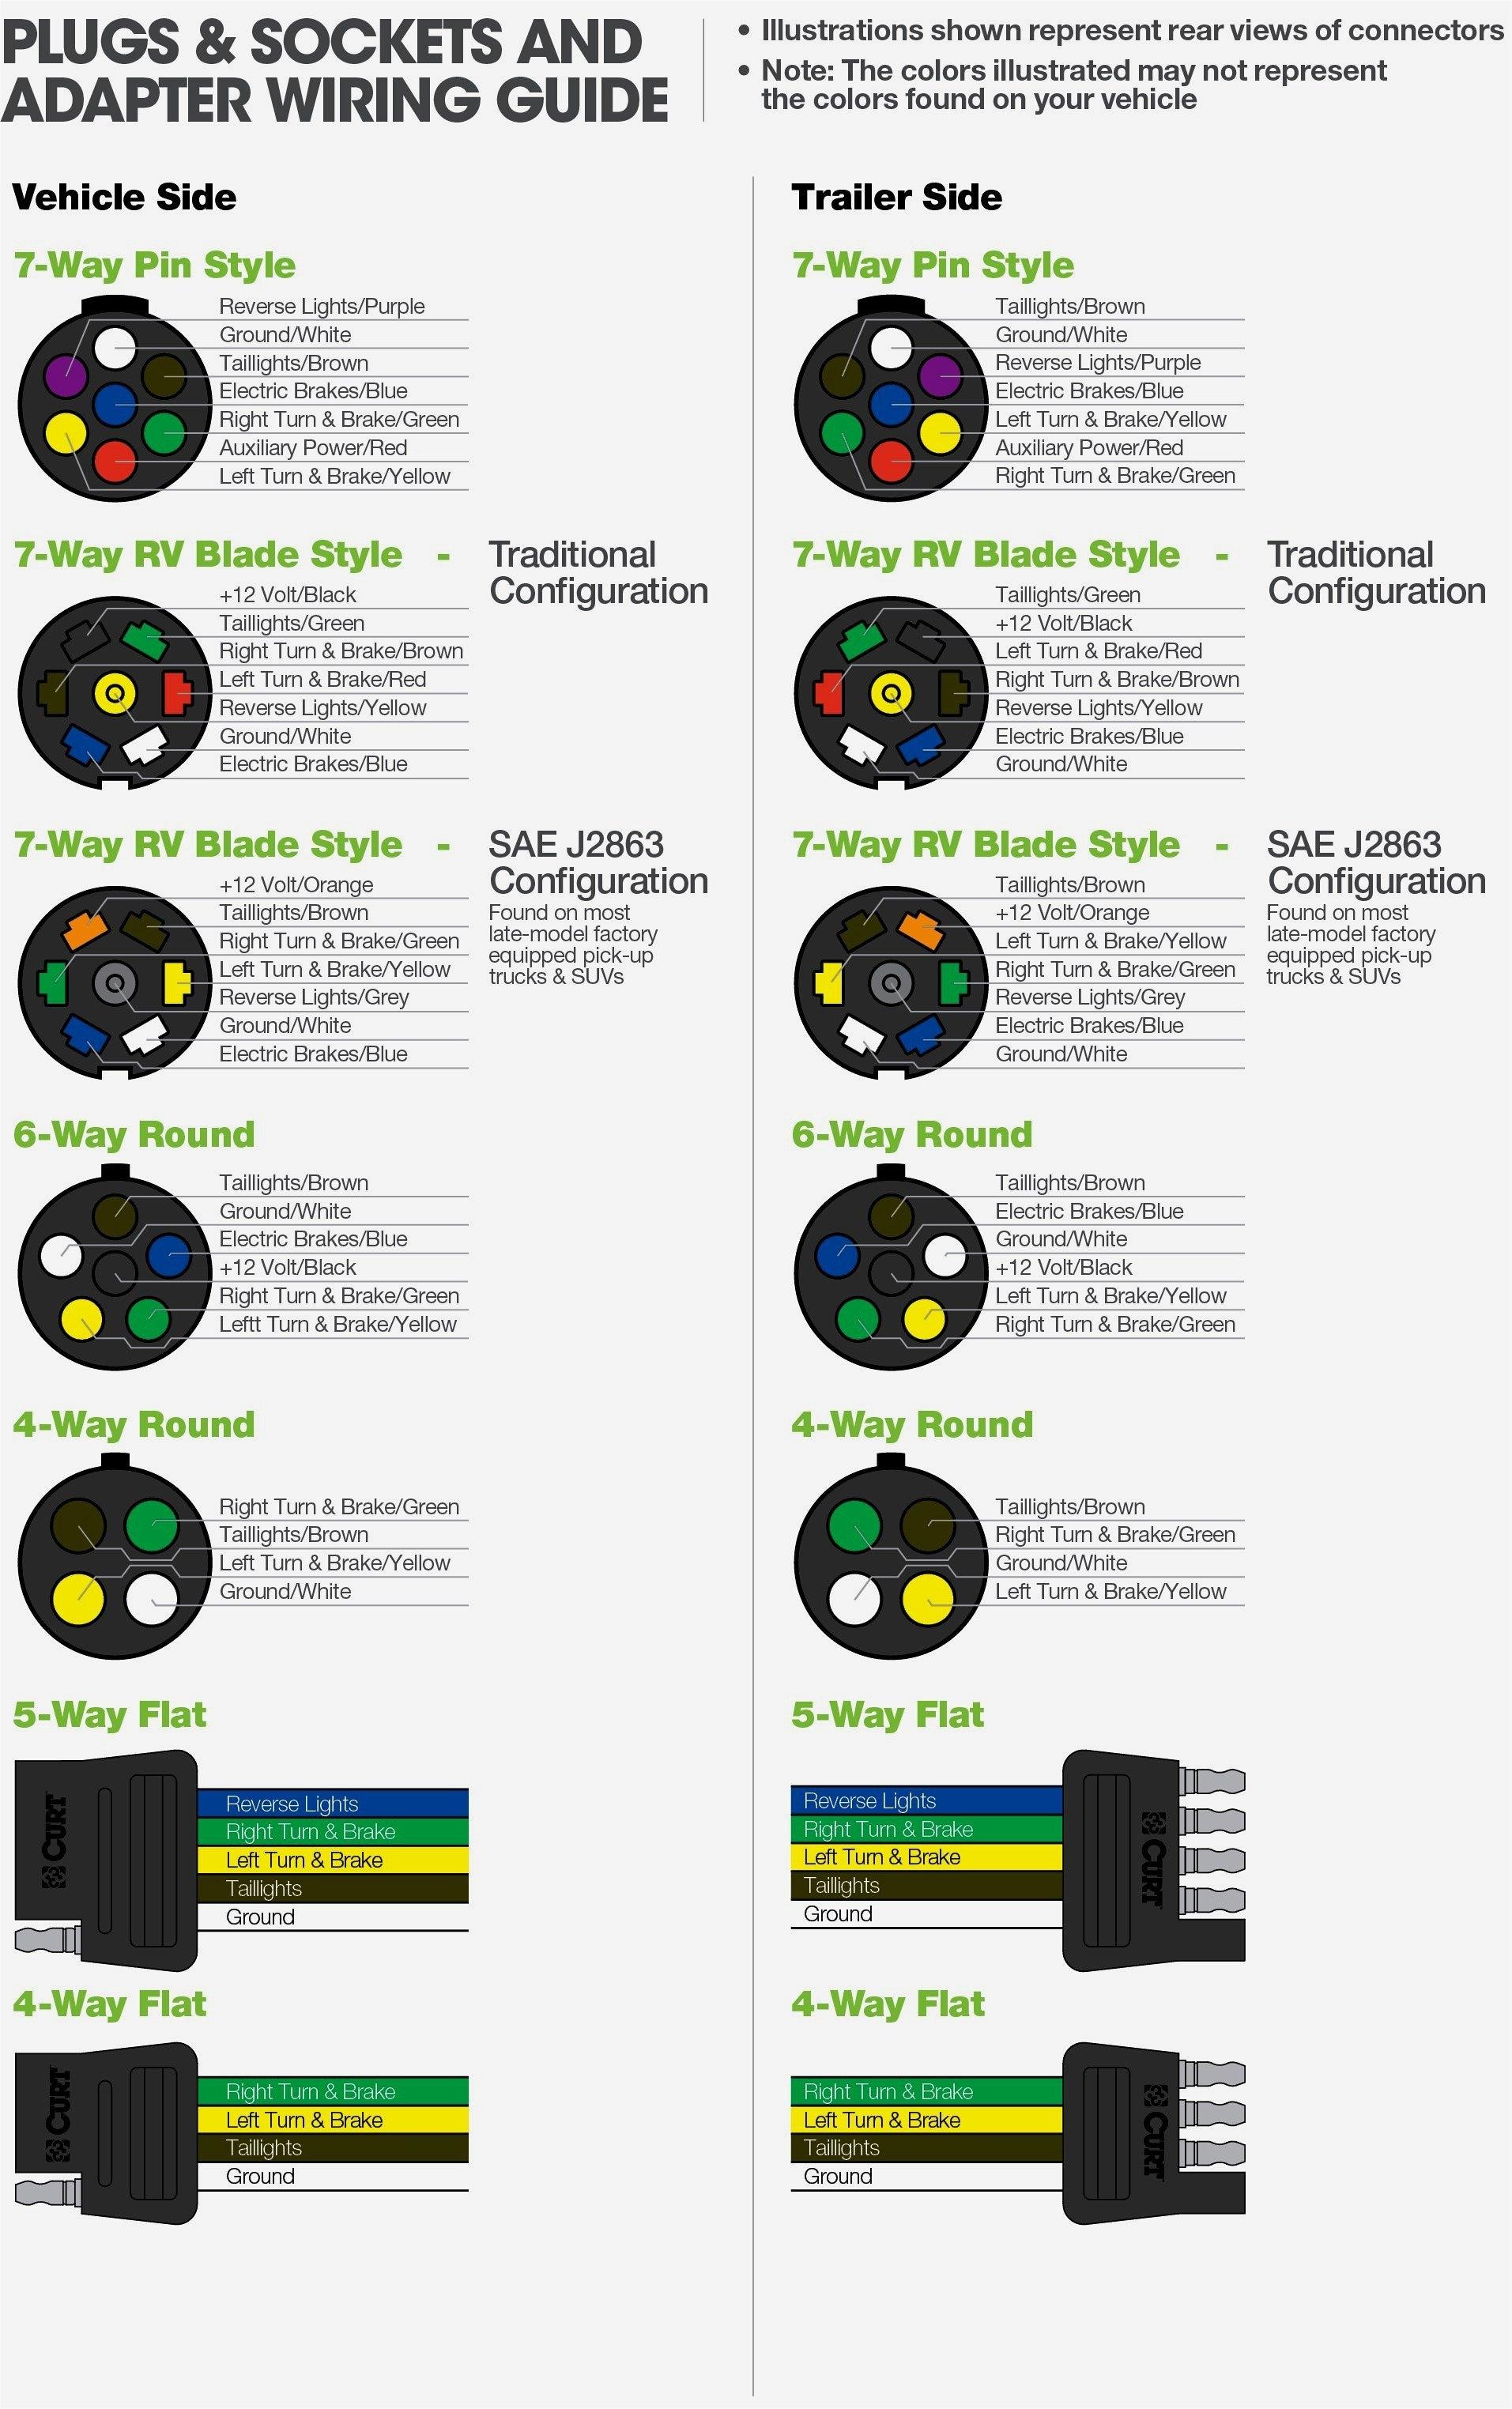 7 Wire Trailer Plug Wiring Diagram - Wiring Diagrams Hubs - 7 Way Plug Wiring Diagram